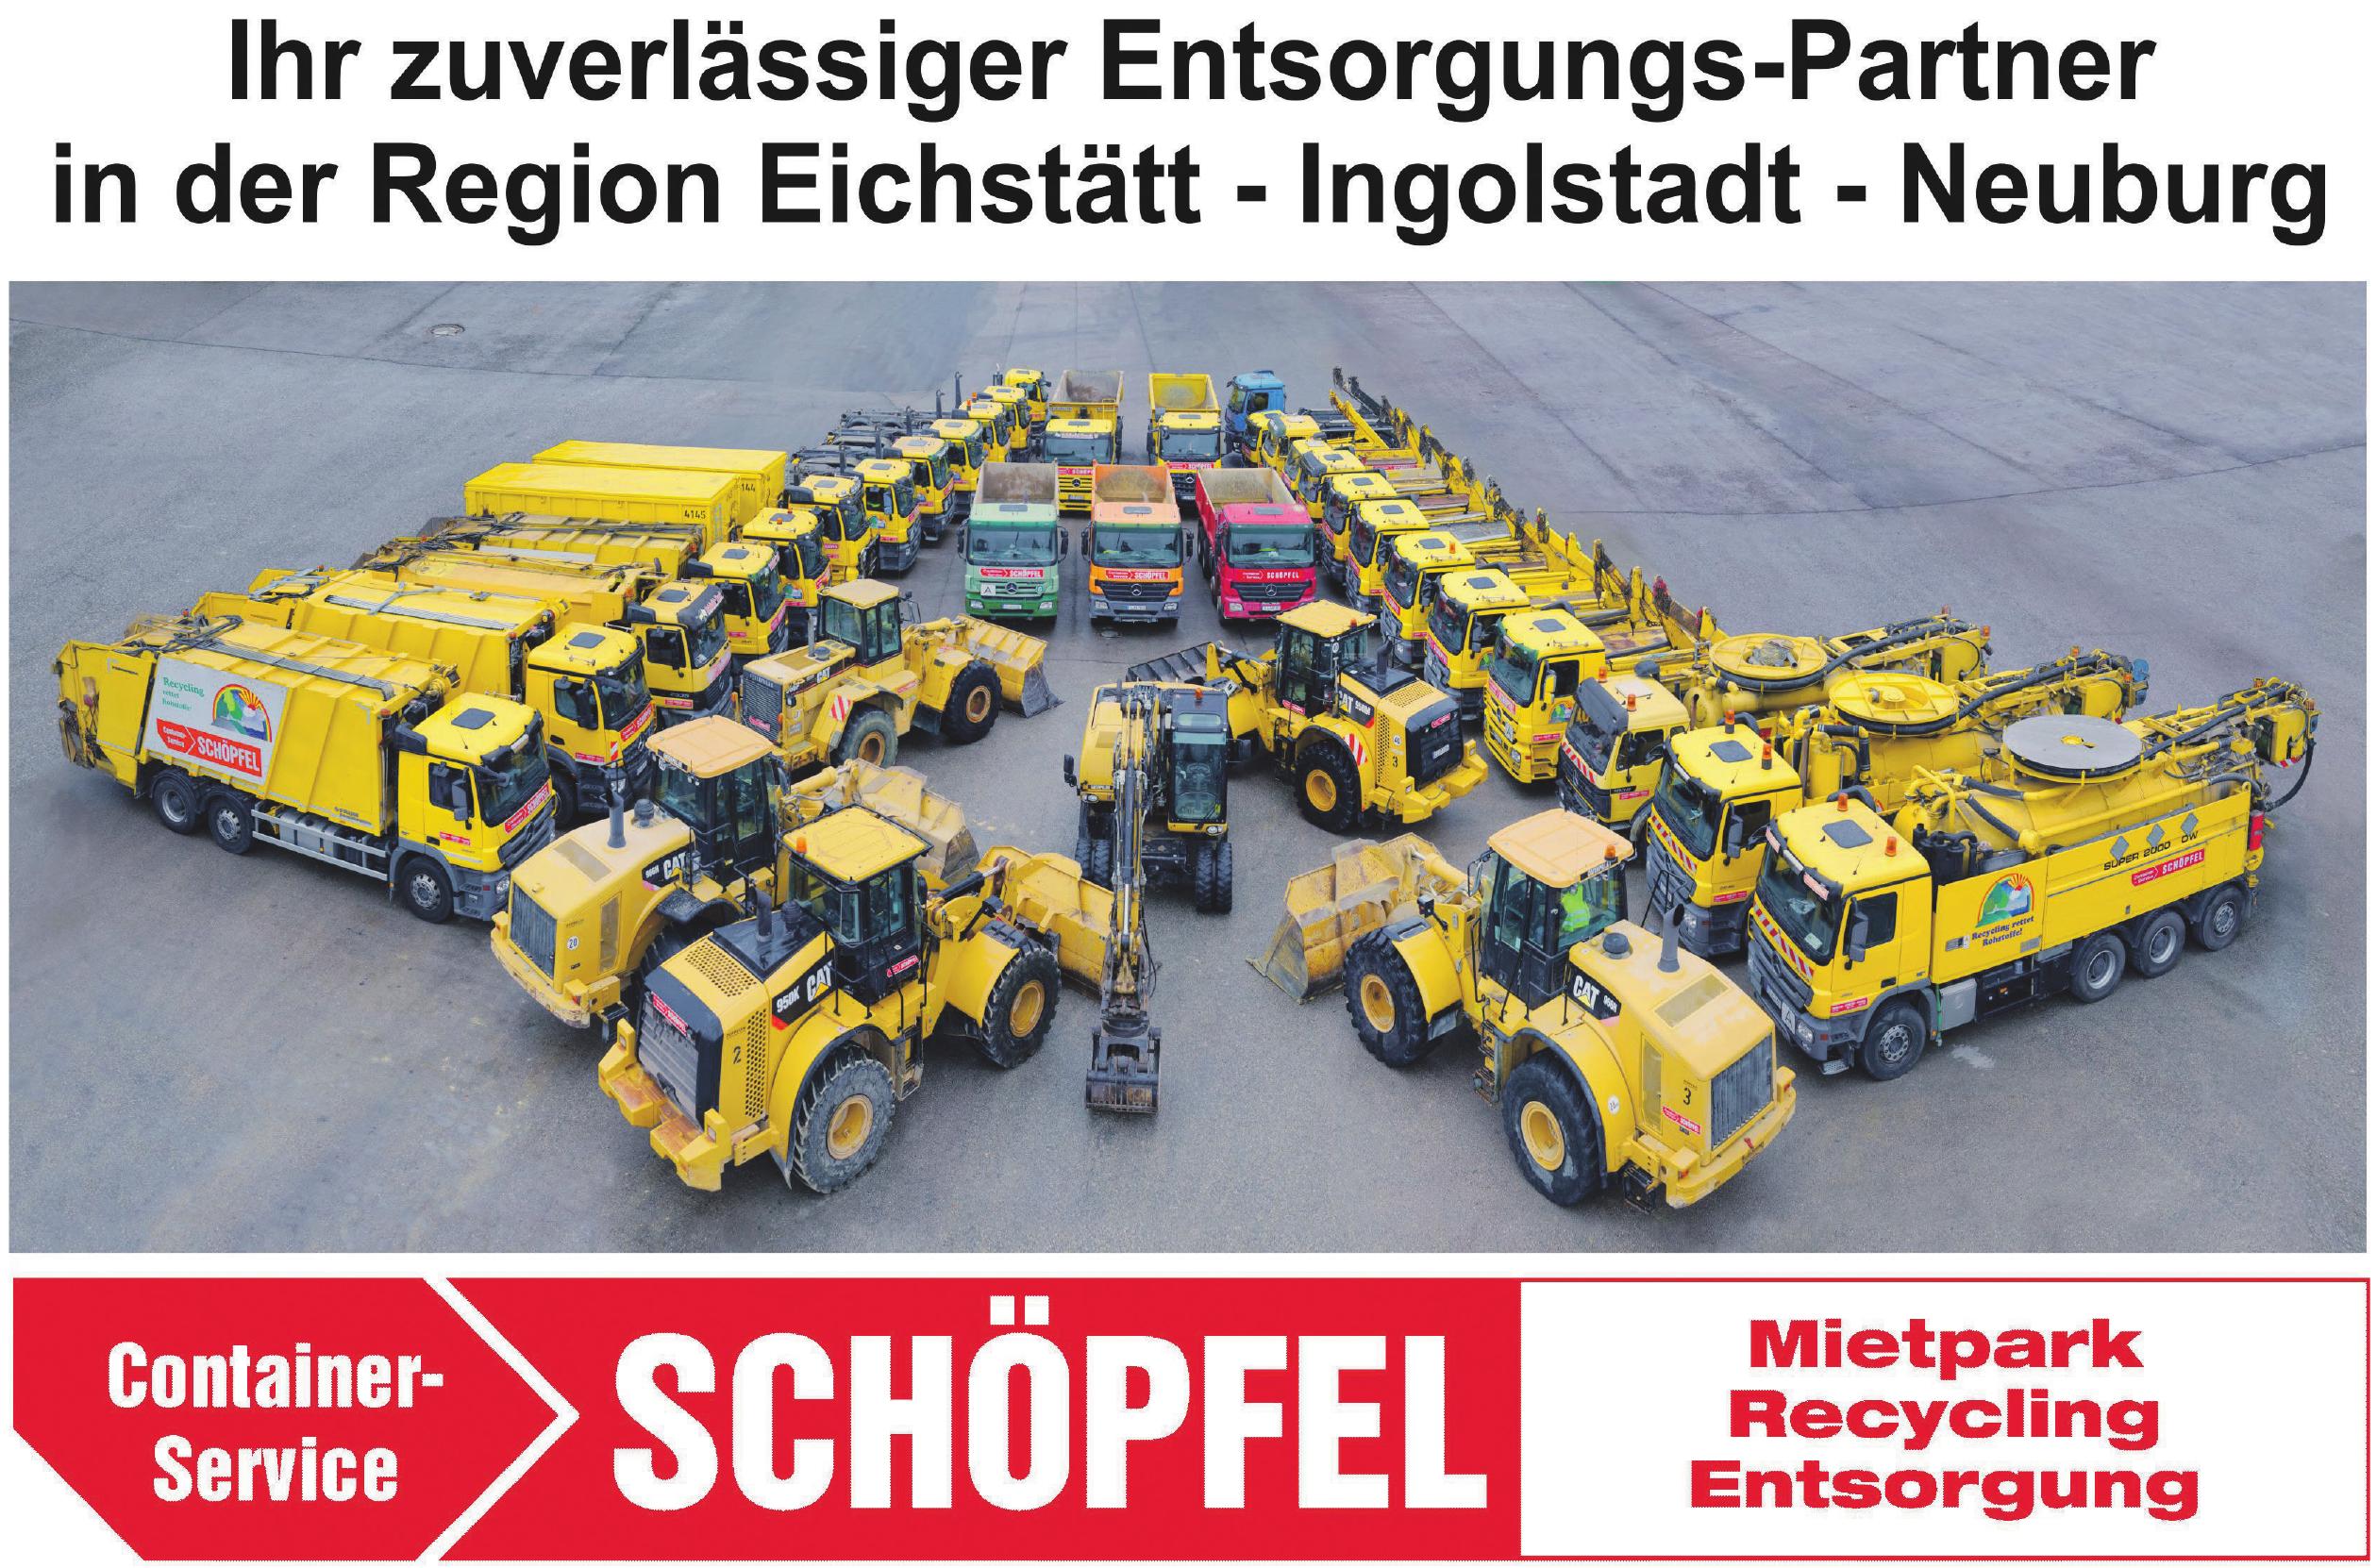 Container-Service Schöpfel